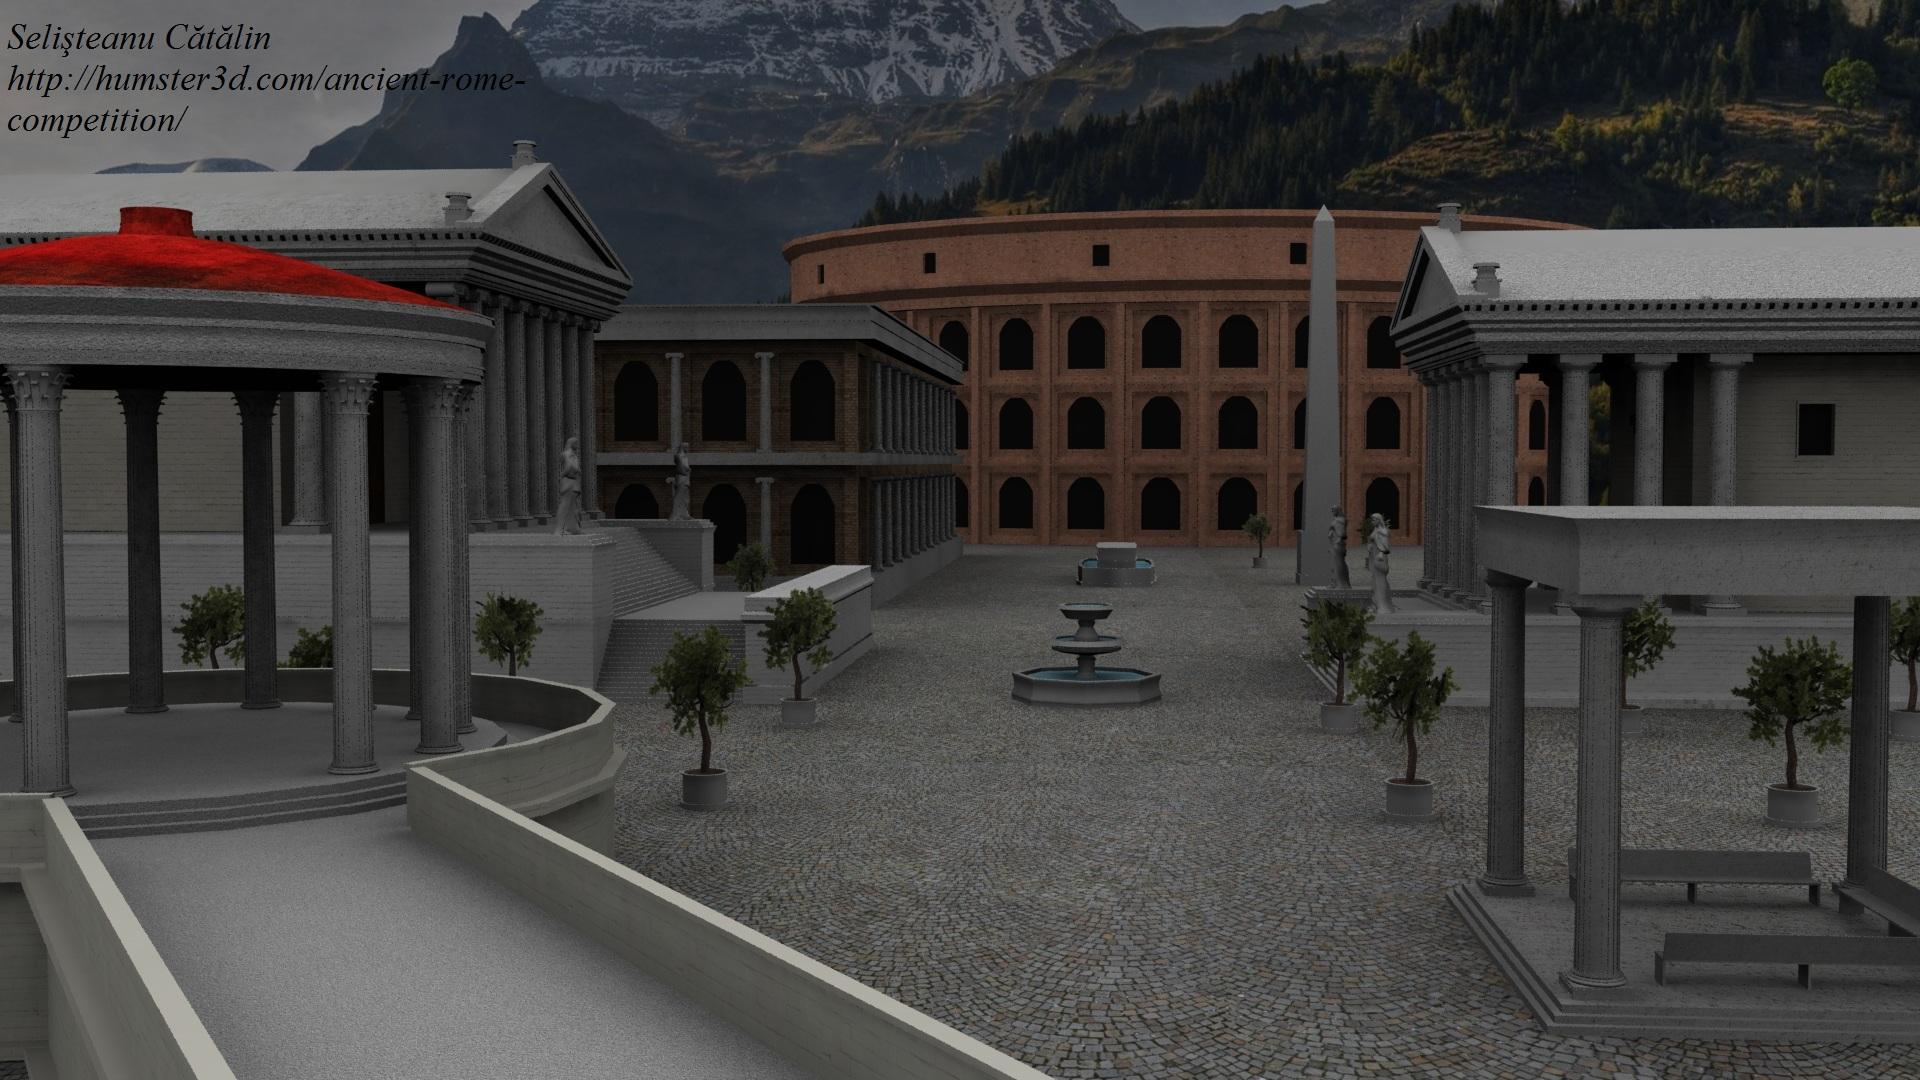 City of Rome 3d art